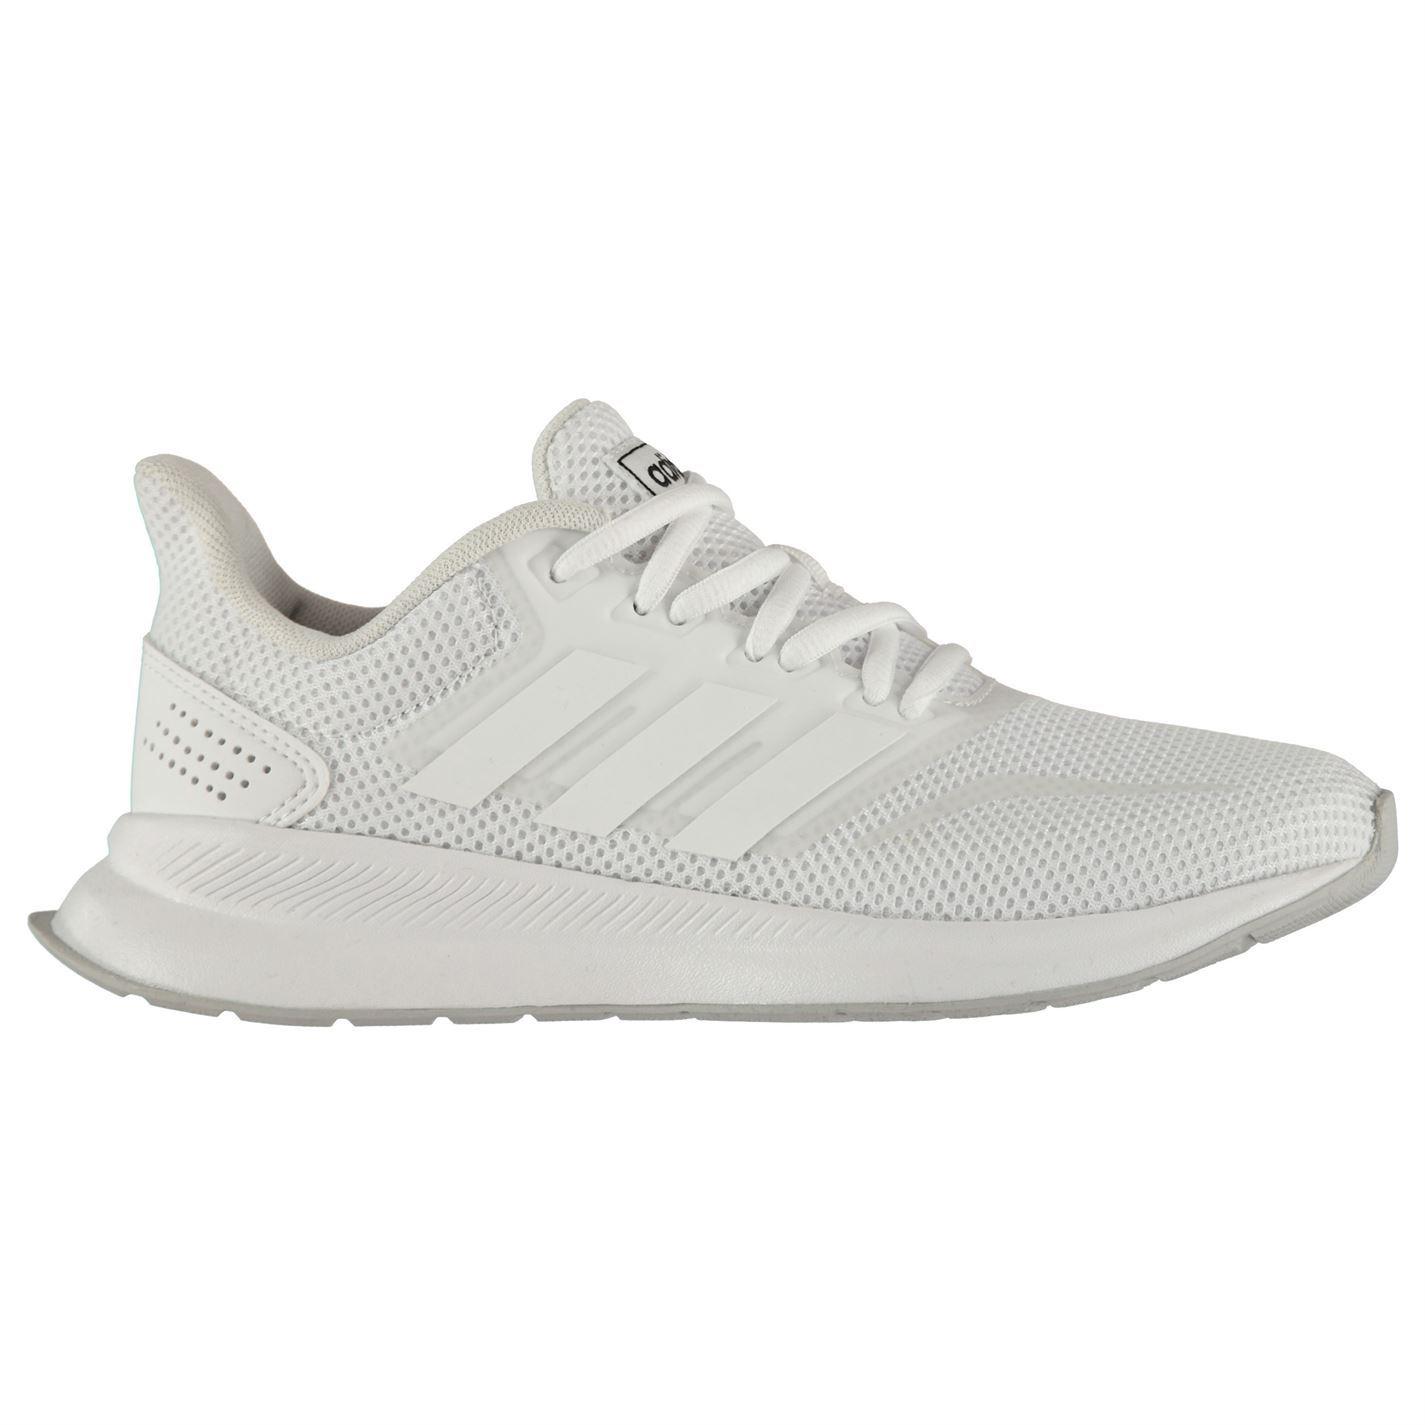 adidas-Falcon-Trainers-Junior-Boys-Shoes-Footwear thumbnail 10